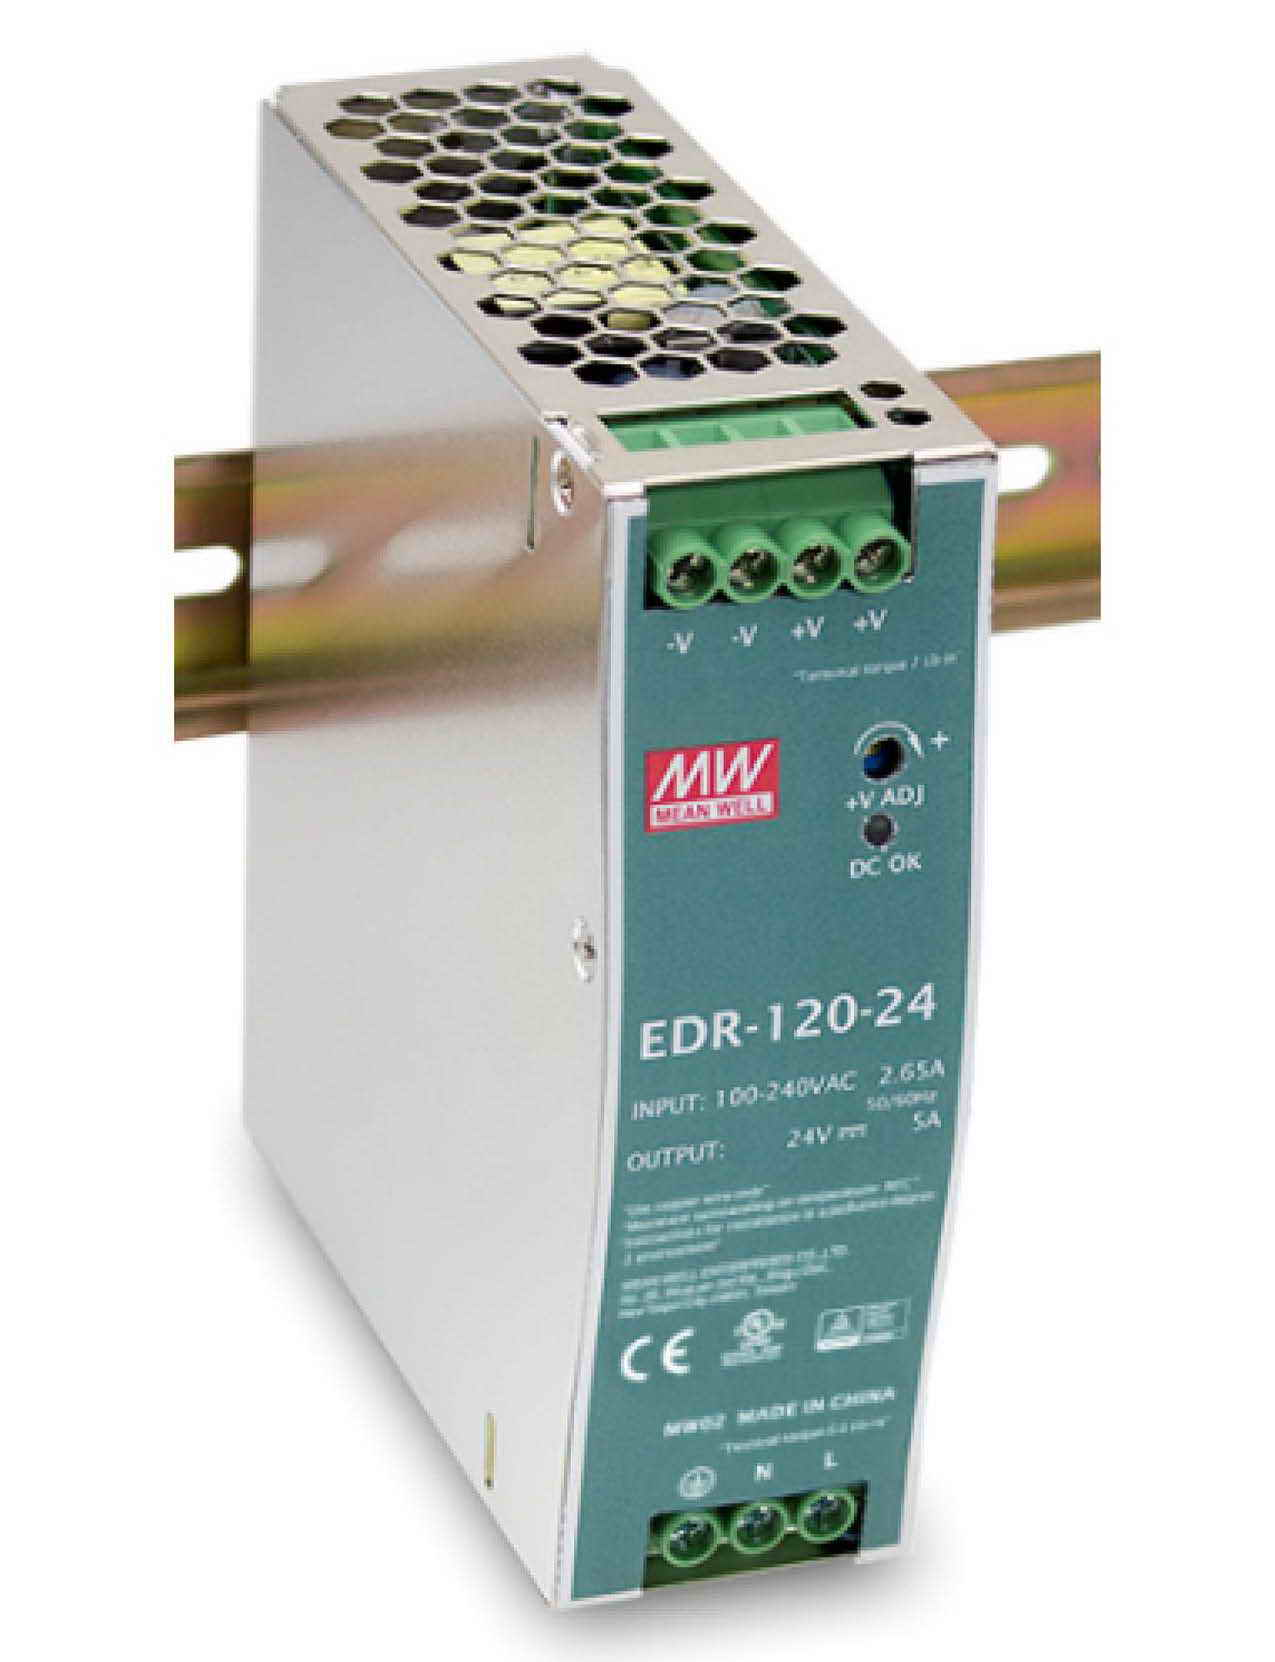 EDR-120, منبع تغذیه ریلی مینول 120 وات, Mean Well , EDR-120-24, MW, EDR-120-48 , EDR-120-12